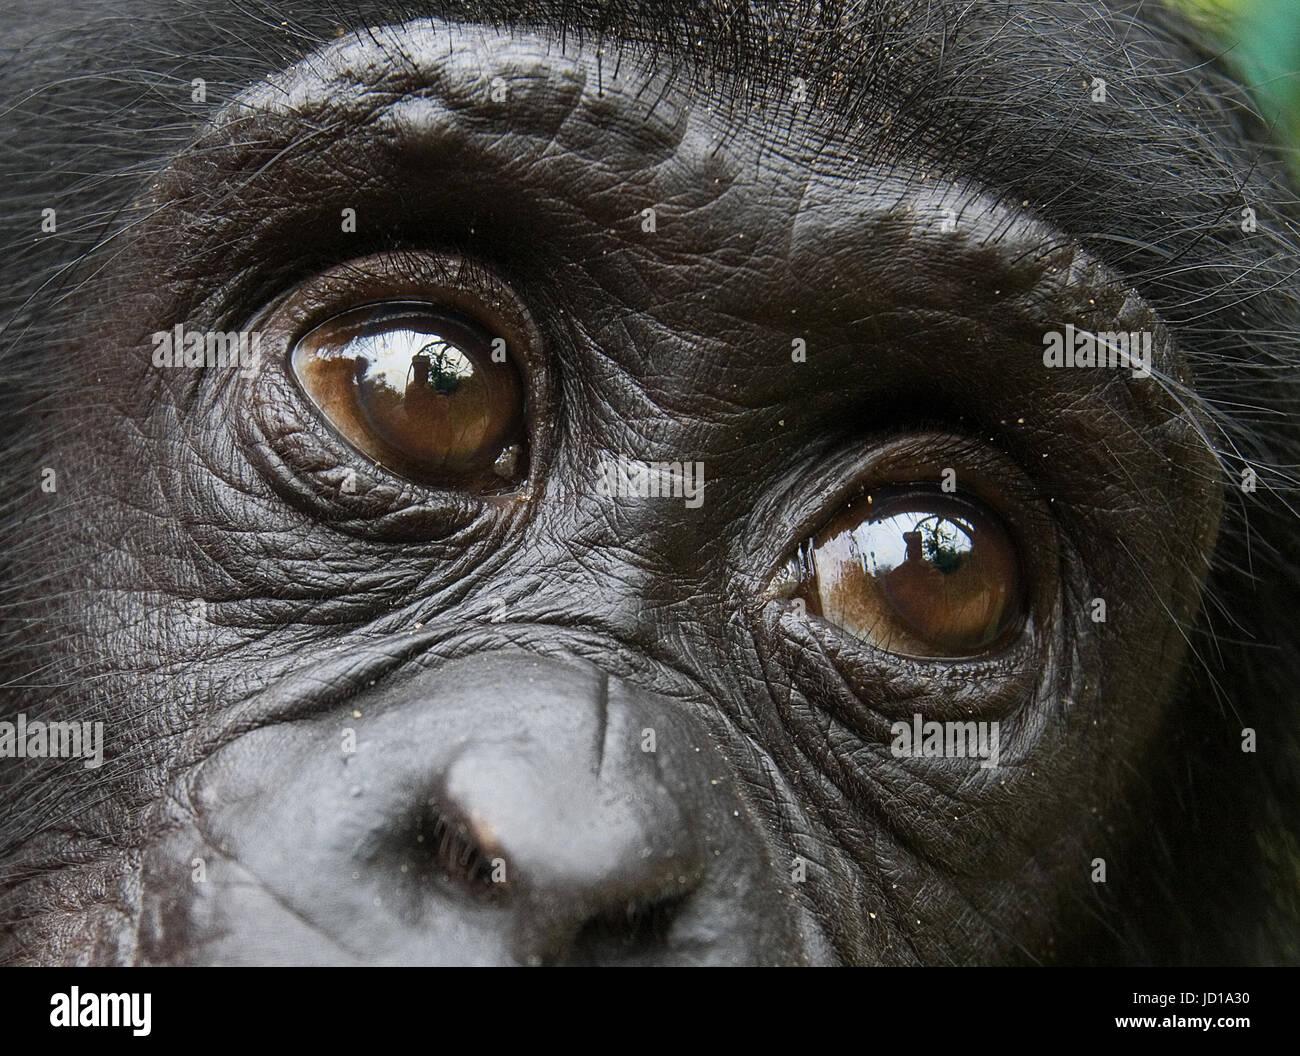 Portrait of a baby bonobo. Democratic Republic of Congo. Lola Ya BONOBO National Park. An excellent illustration. - Stock Image